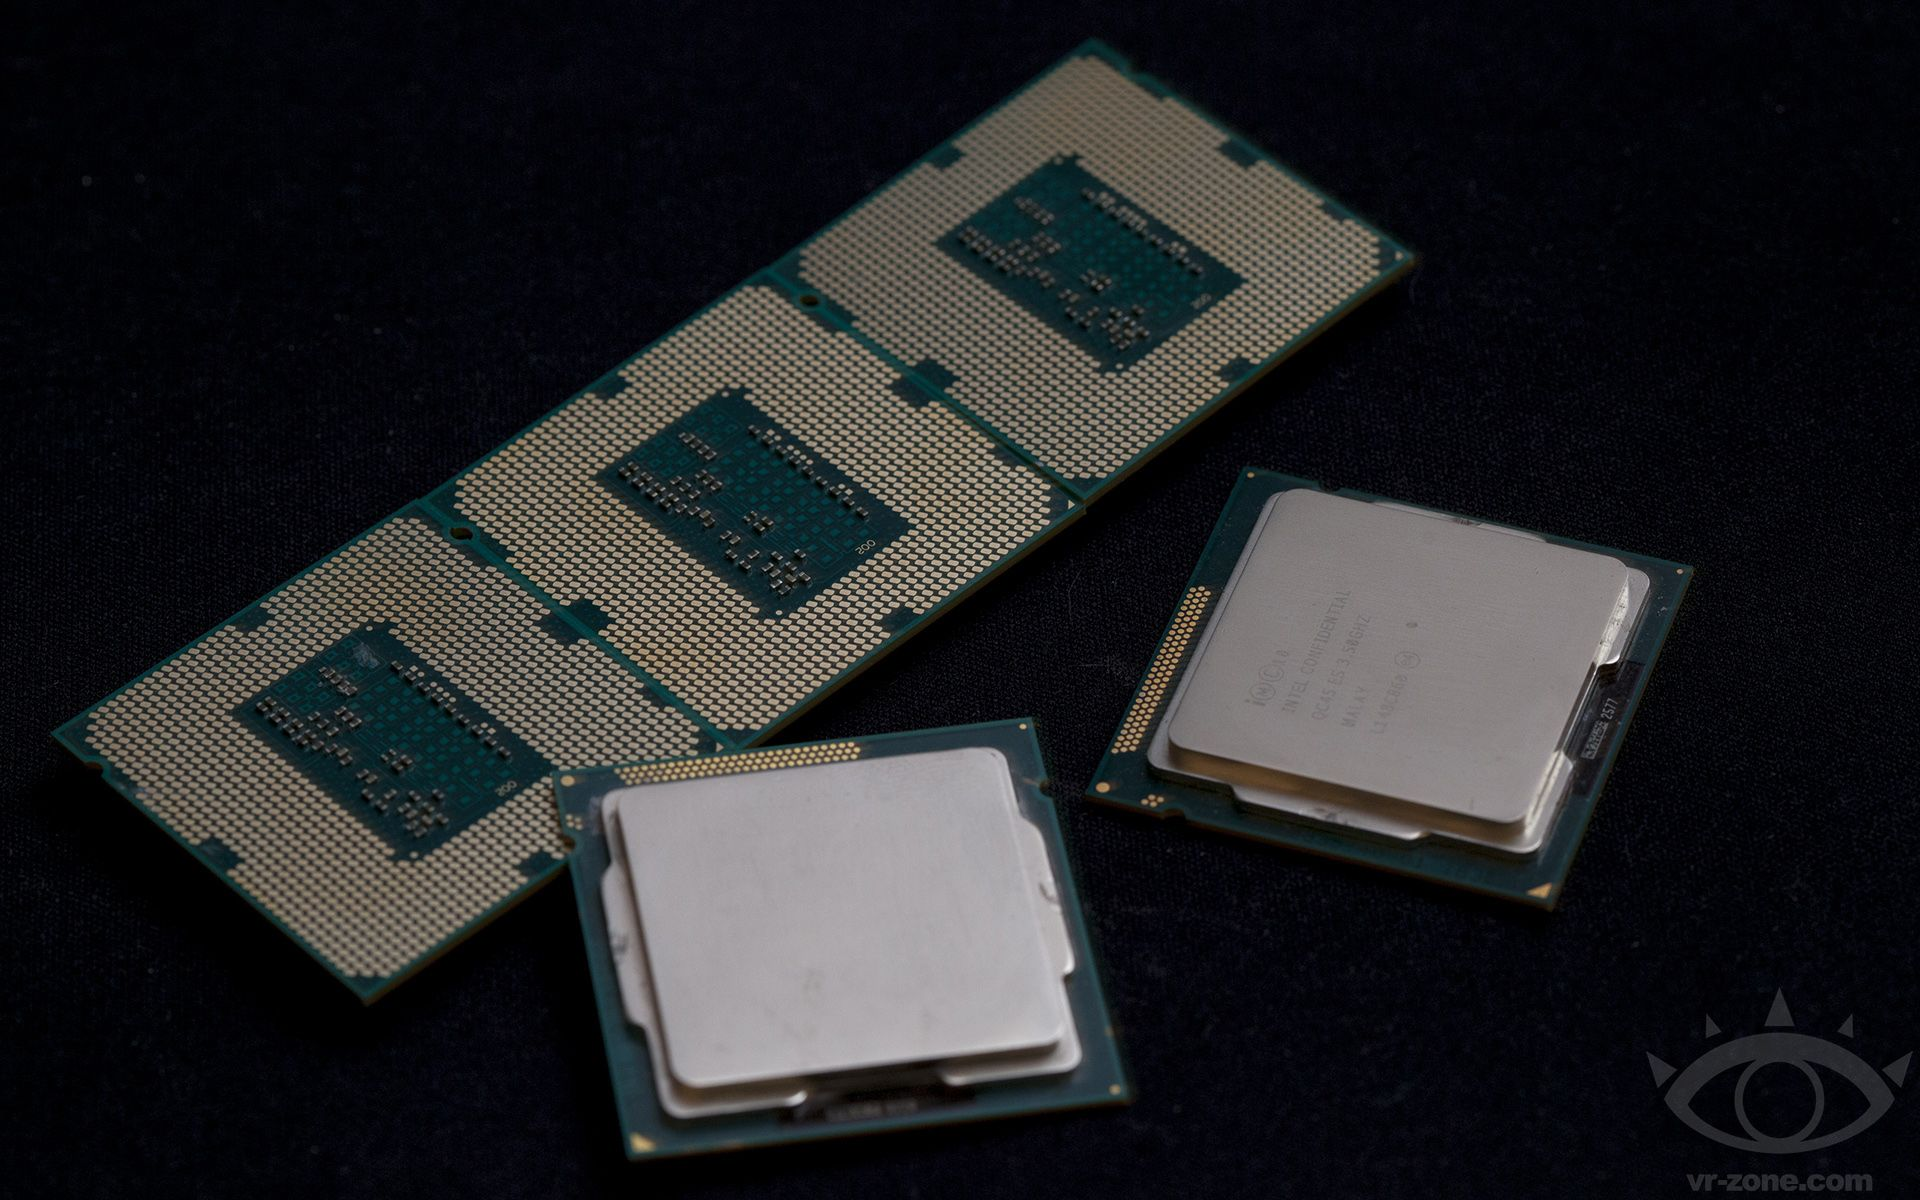 Skylake 處理器或為 Braswell 平台,Intel 將更重視 Android 作業系統 - http://chinese.vr-zone.com/93079/skylake-cpu-will-belong-to-braswell-platform-and-intel-x86-cpu-will-get-more-android-support-future-12032013/